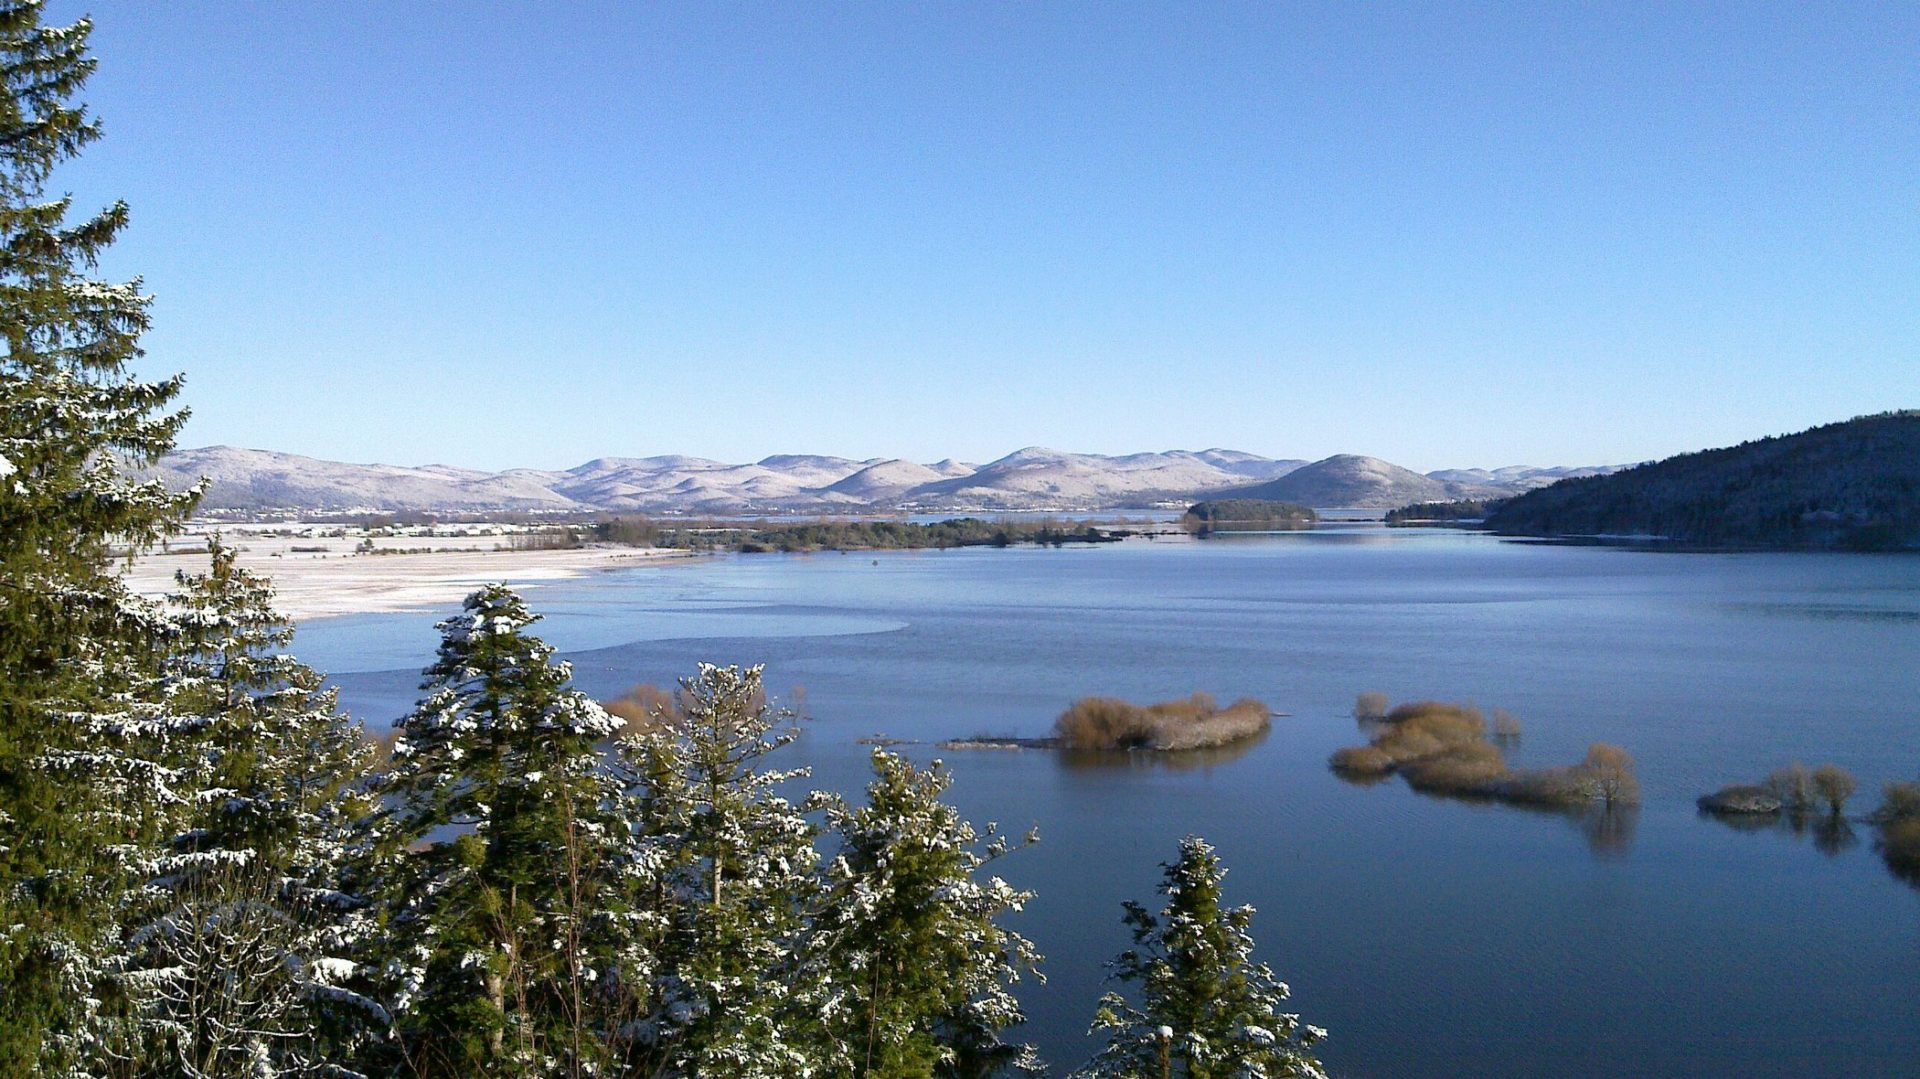 Jezioro Cerknickie zimą